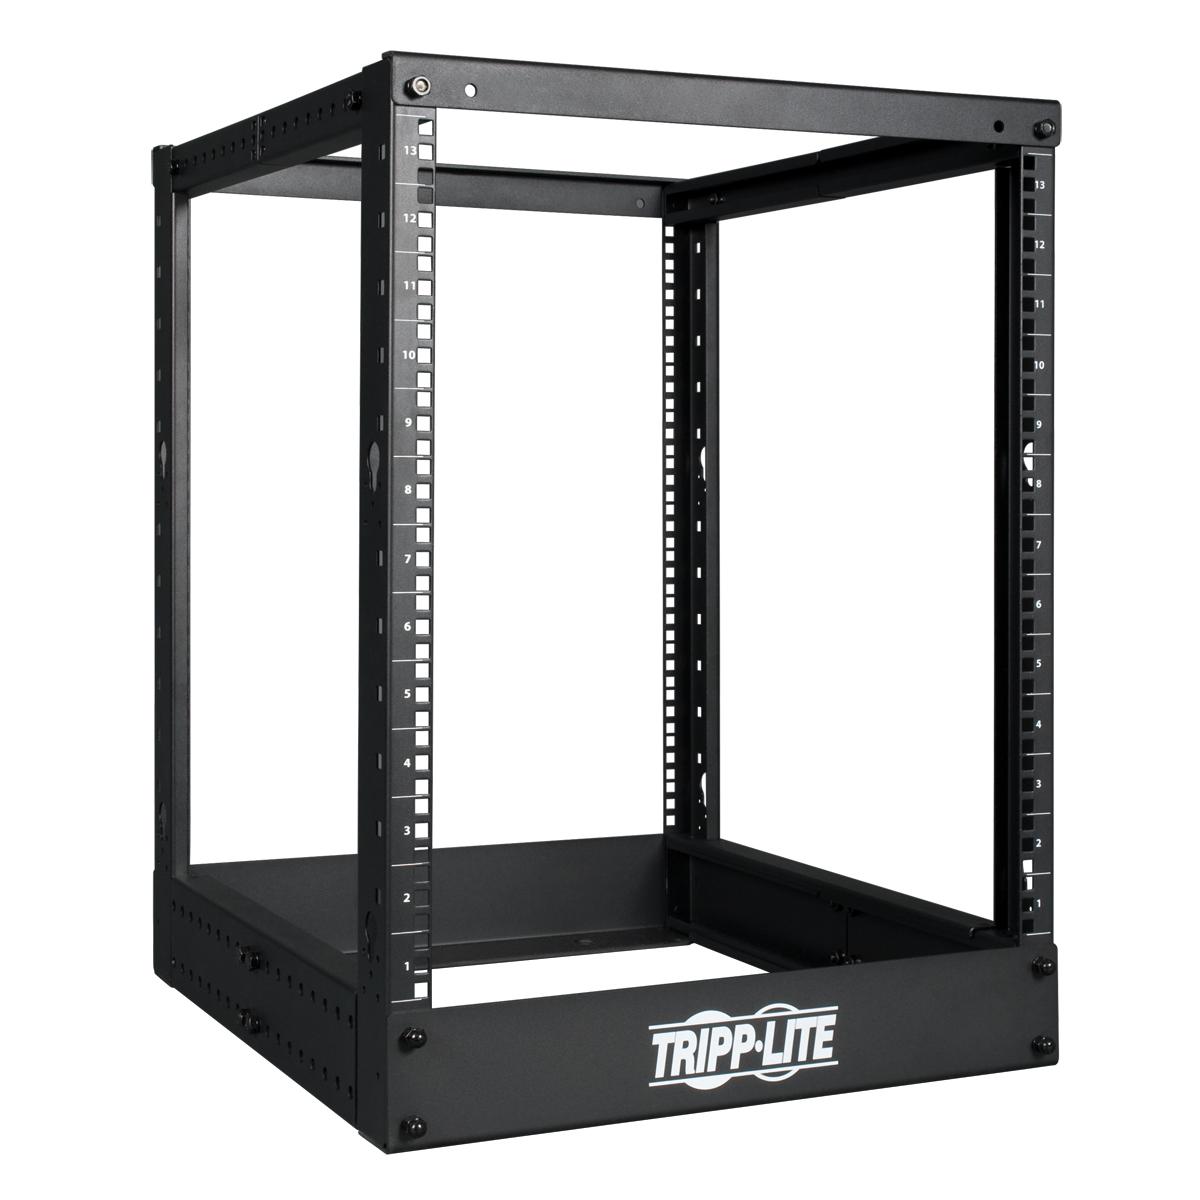 13RU SmartRack 4-Post Open Frame Rack